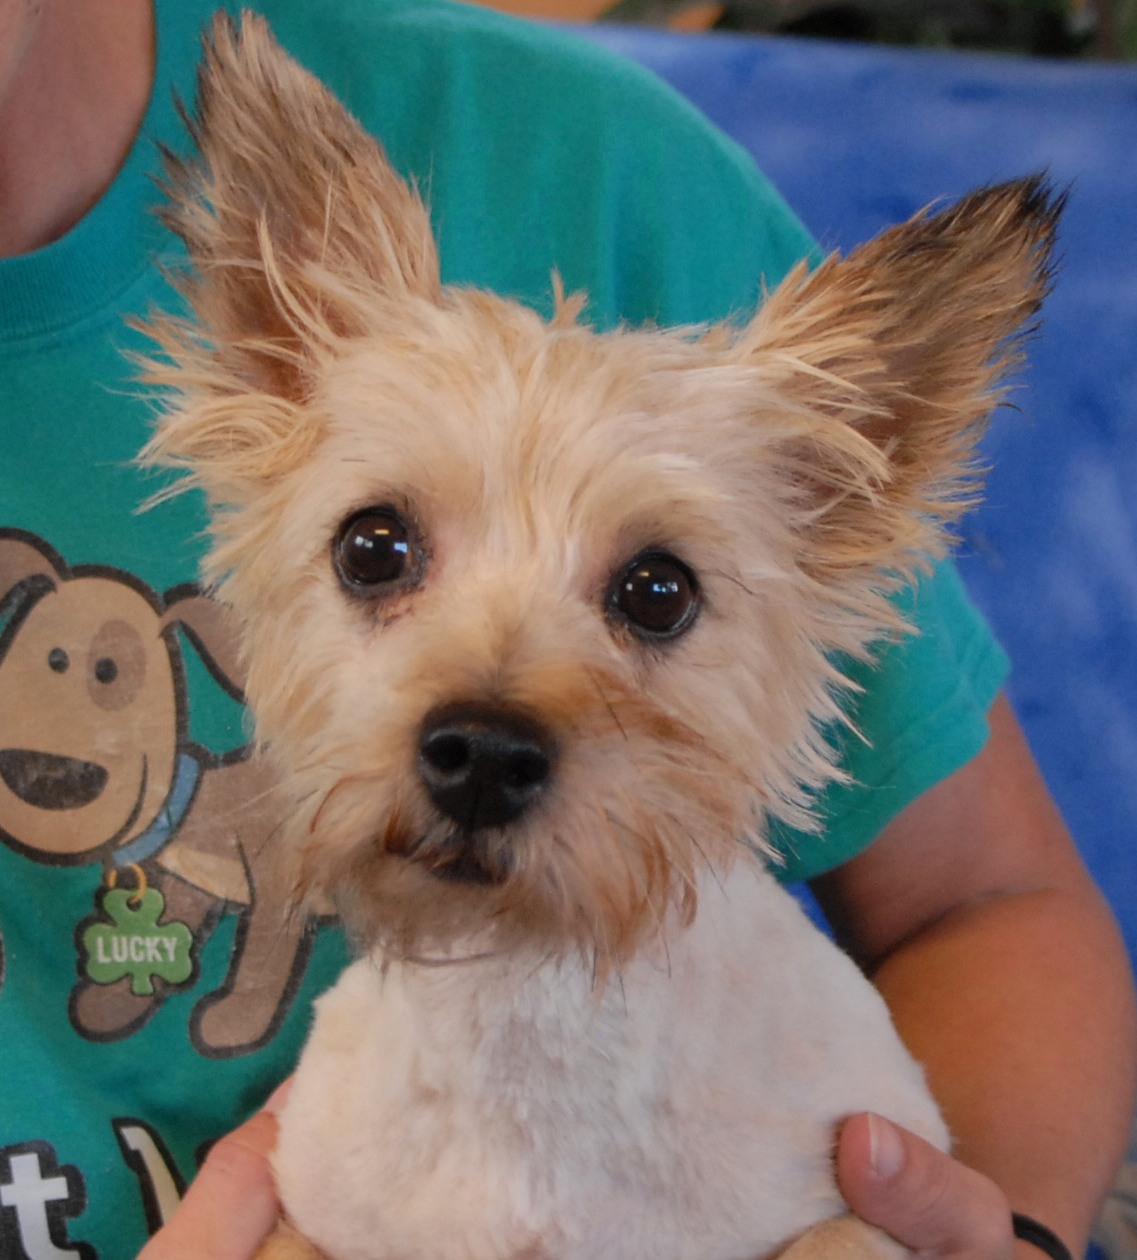 Nevada SPCA Animal Rescue: No one has ever told me I'm pretty before.